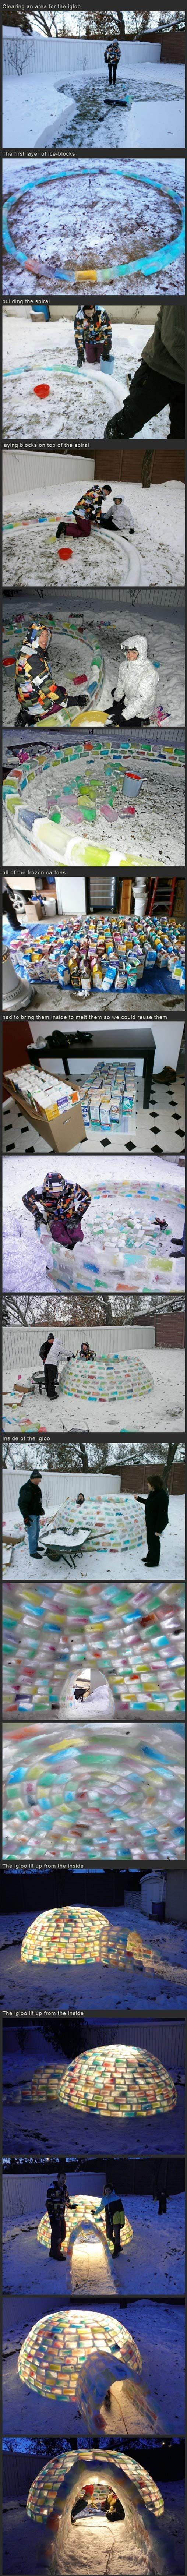 colored ice igloo. Do it to arrow!:)